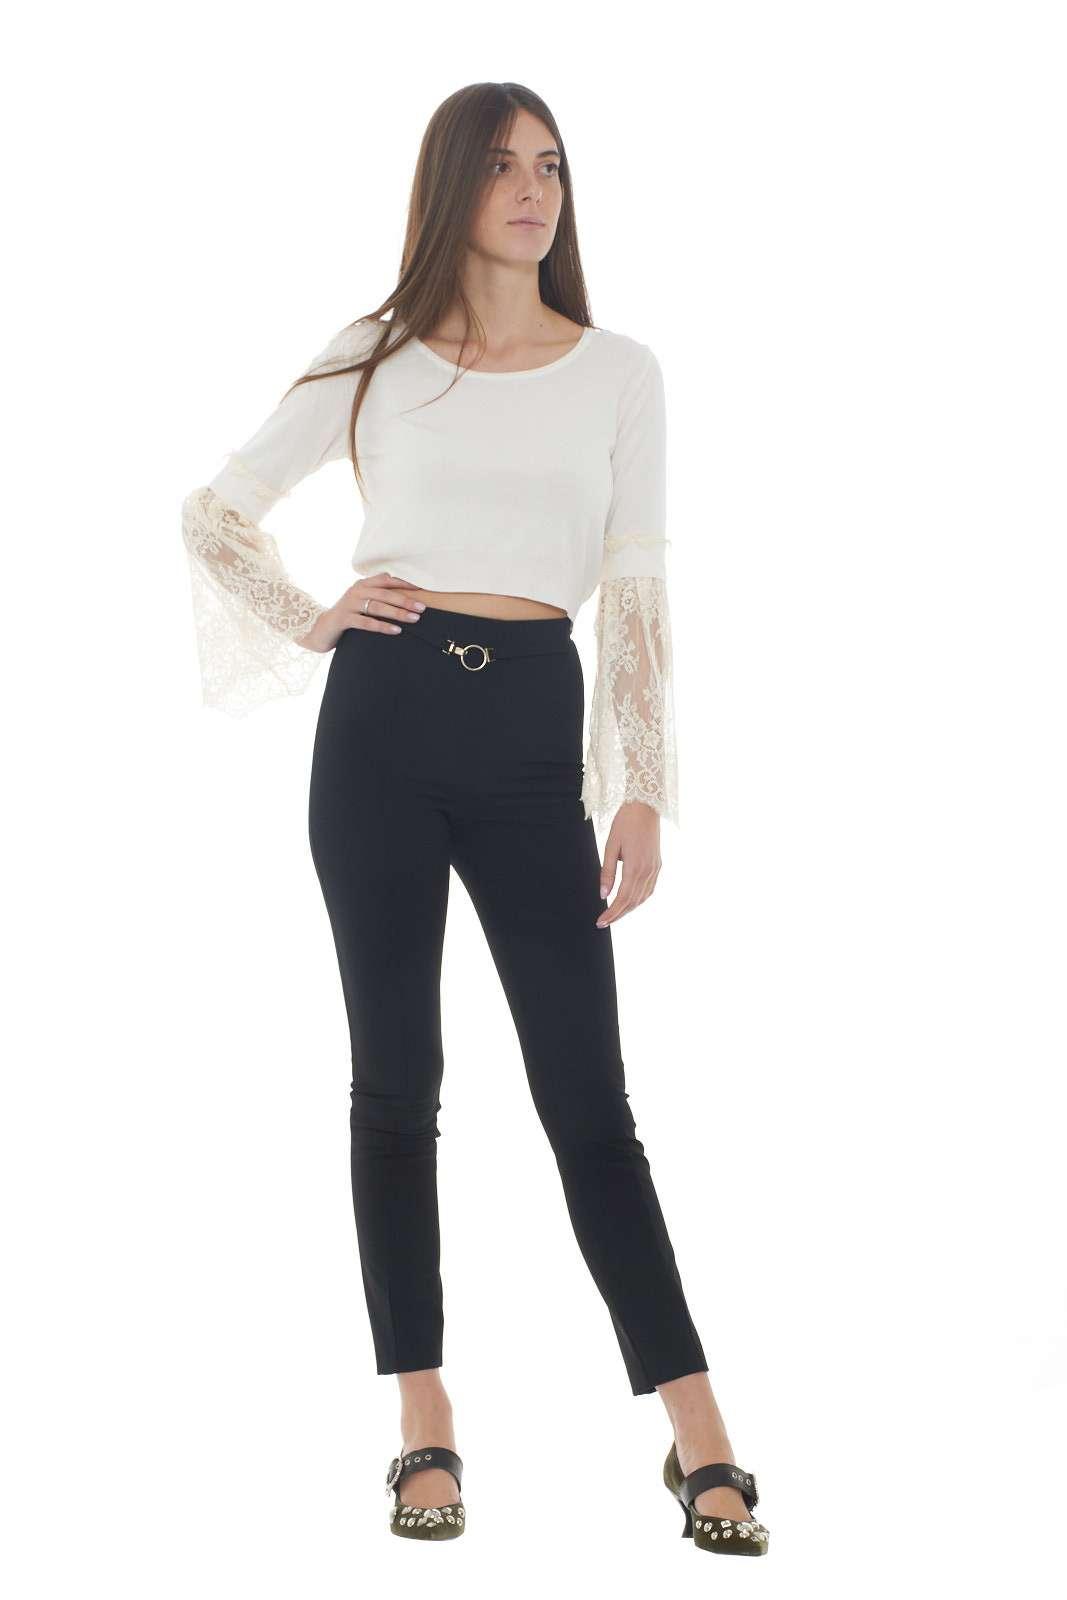 https://www.parmax.com/media/catalog/product/a/i/AI-outlet_parmax-pantaloni-donna-Patrizia-Pepe-8p0230-D.jpg